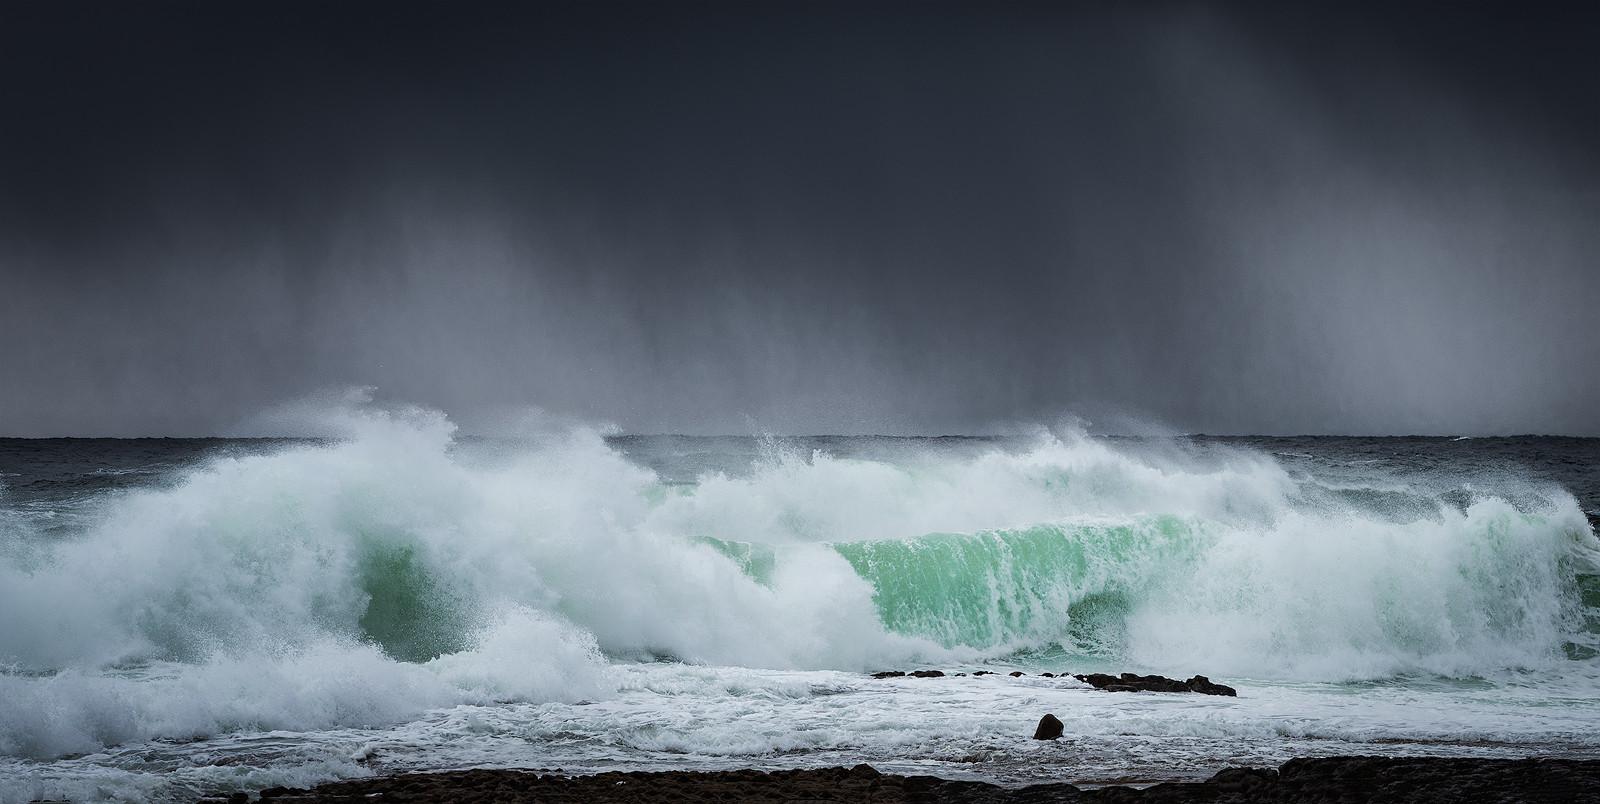 PDI - Storm on the West Coast by Pauline O'Flaherty (9 marks)